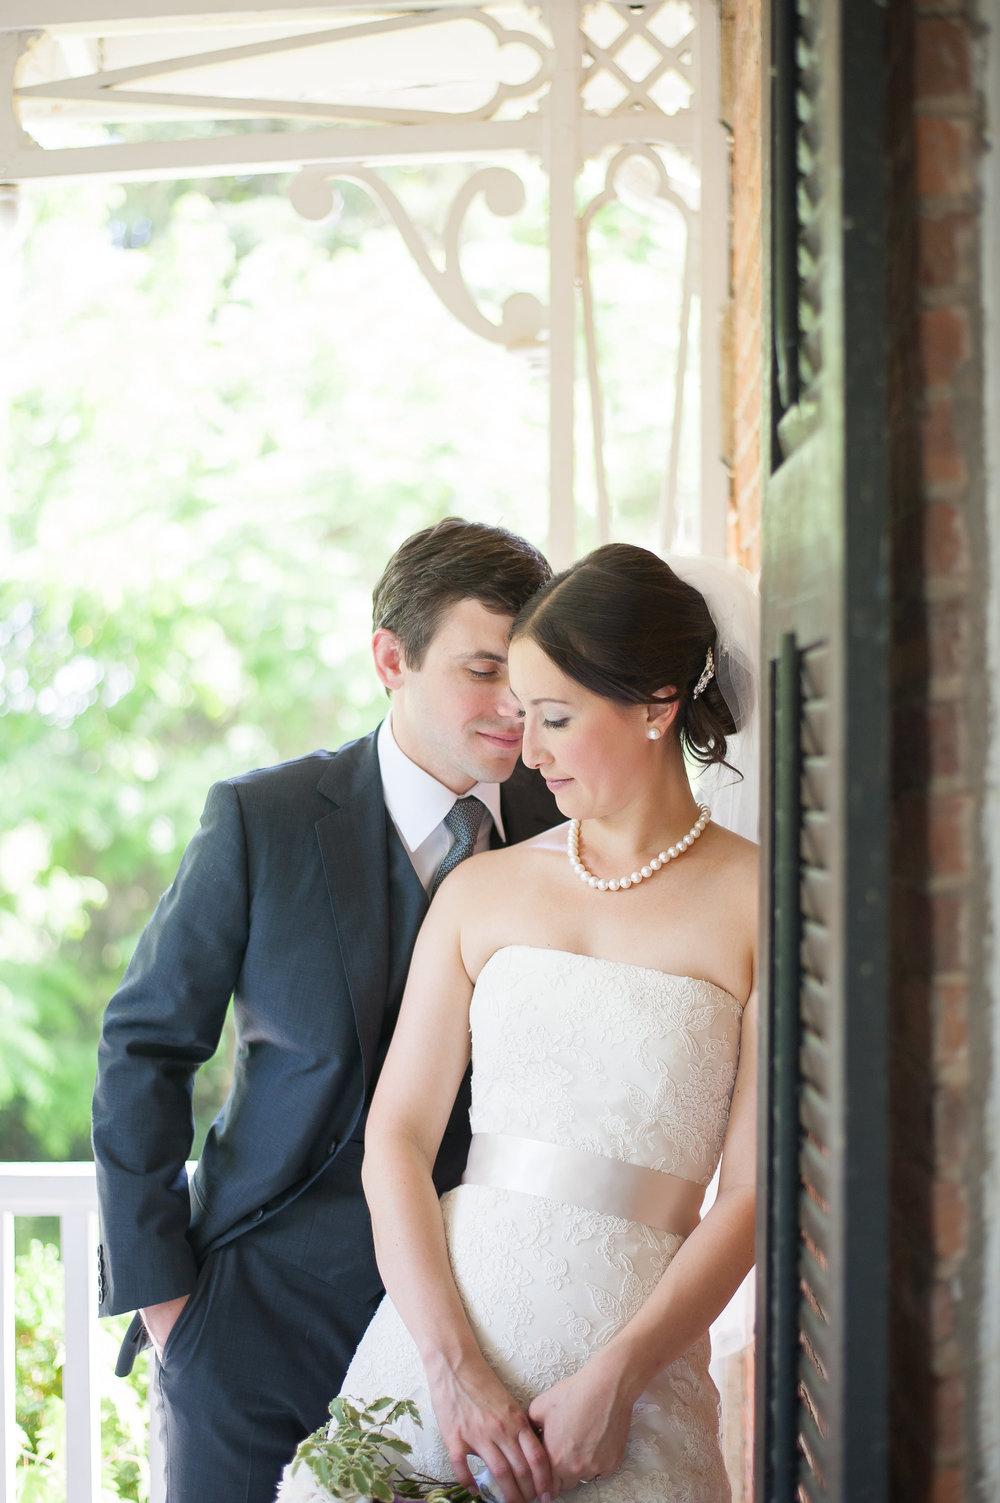 Niagara-Weddings-Gracewood-Estate-Kurtz-Orcahrds-photography-by-Gemini-Photography-021.JPG